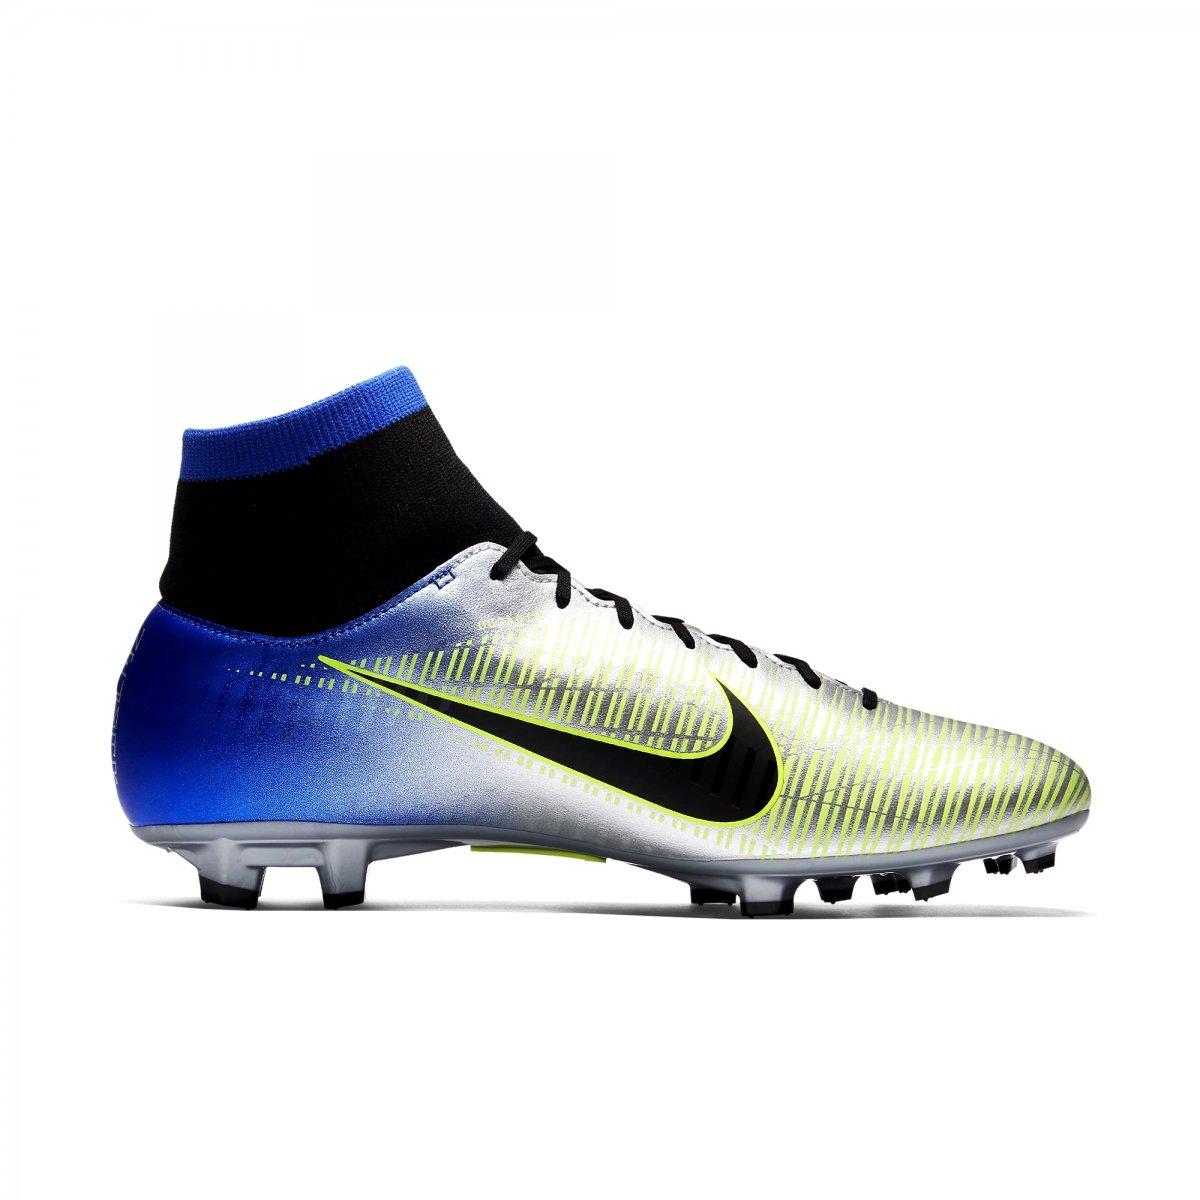 Chuteira Nike Mercurial Victory VI DF Neymar Junior FG 921506-407 Prata Azul c5d07219ed61d